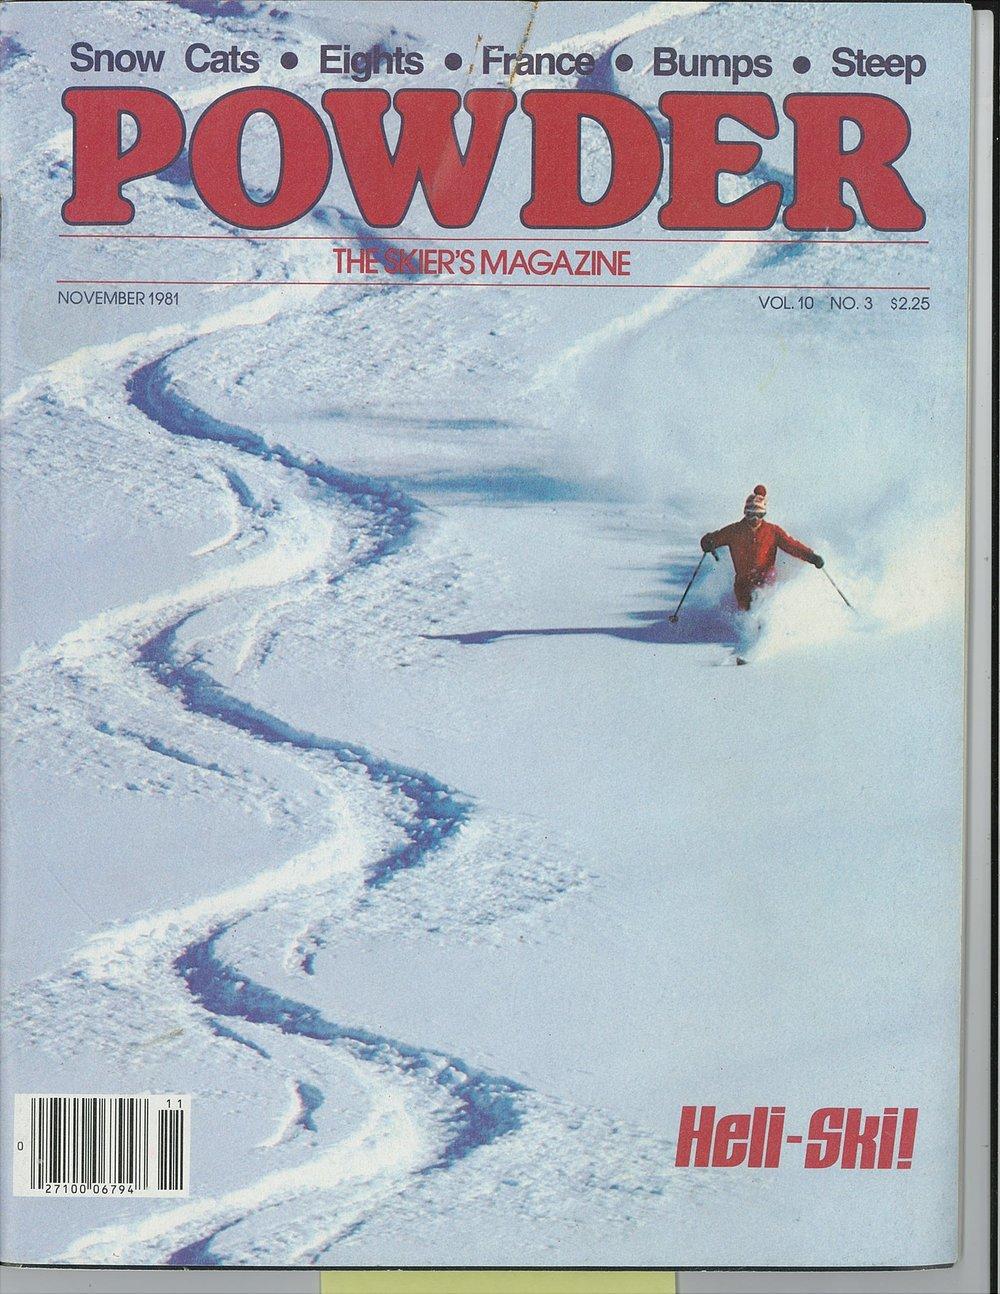 1981 - Powder_Page_1.jpg